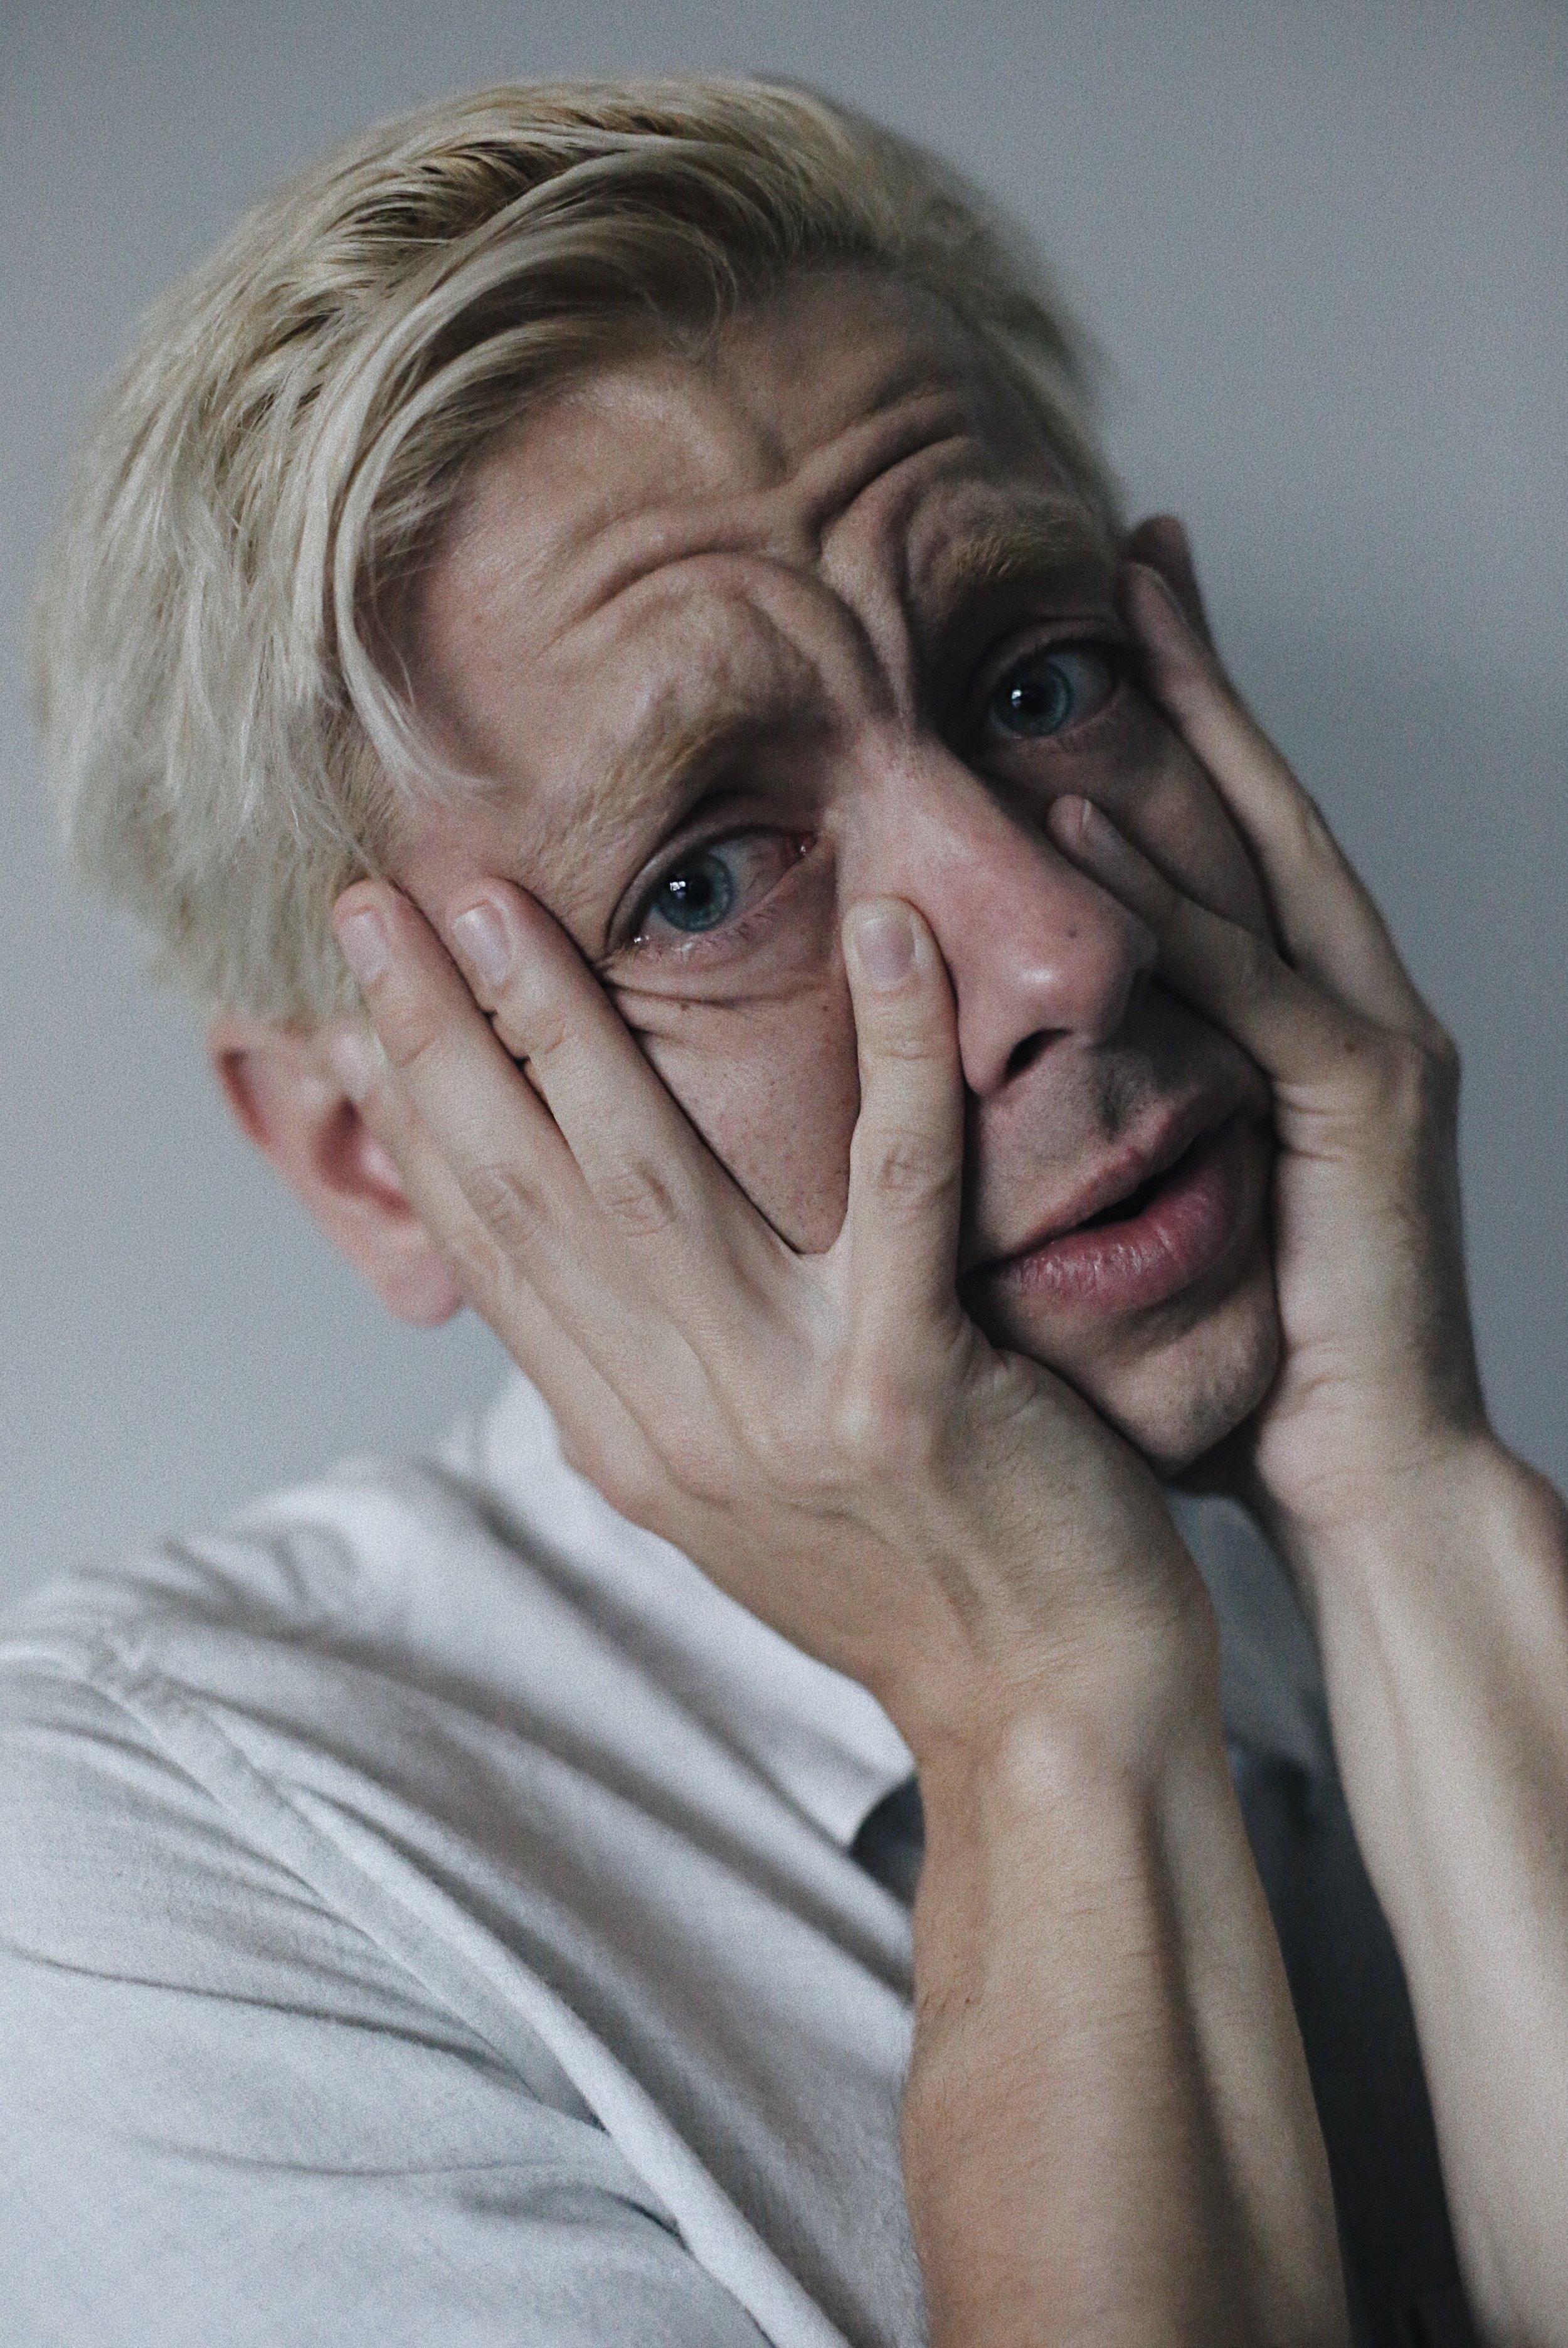 Klaus david simon crying.jpg